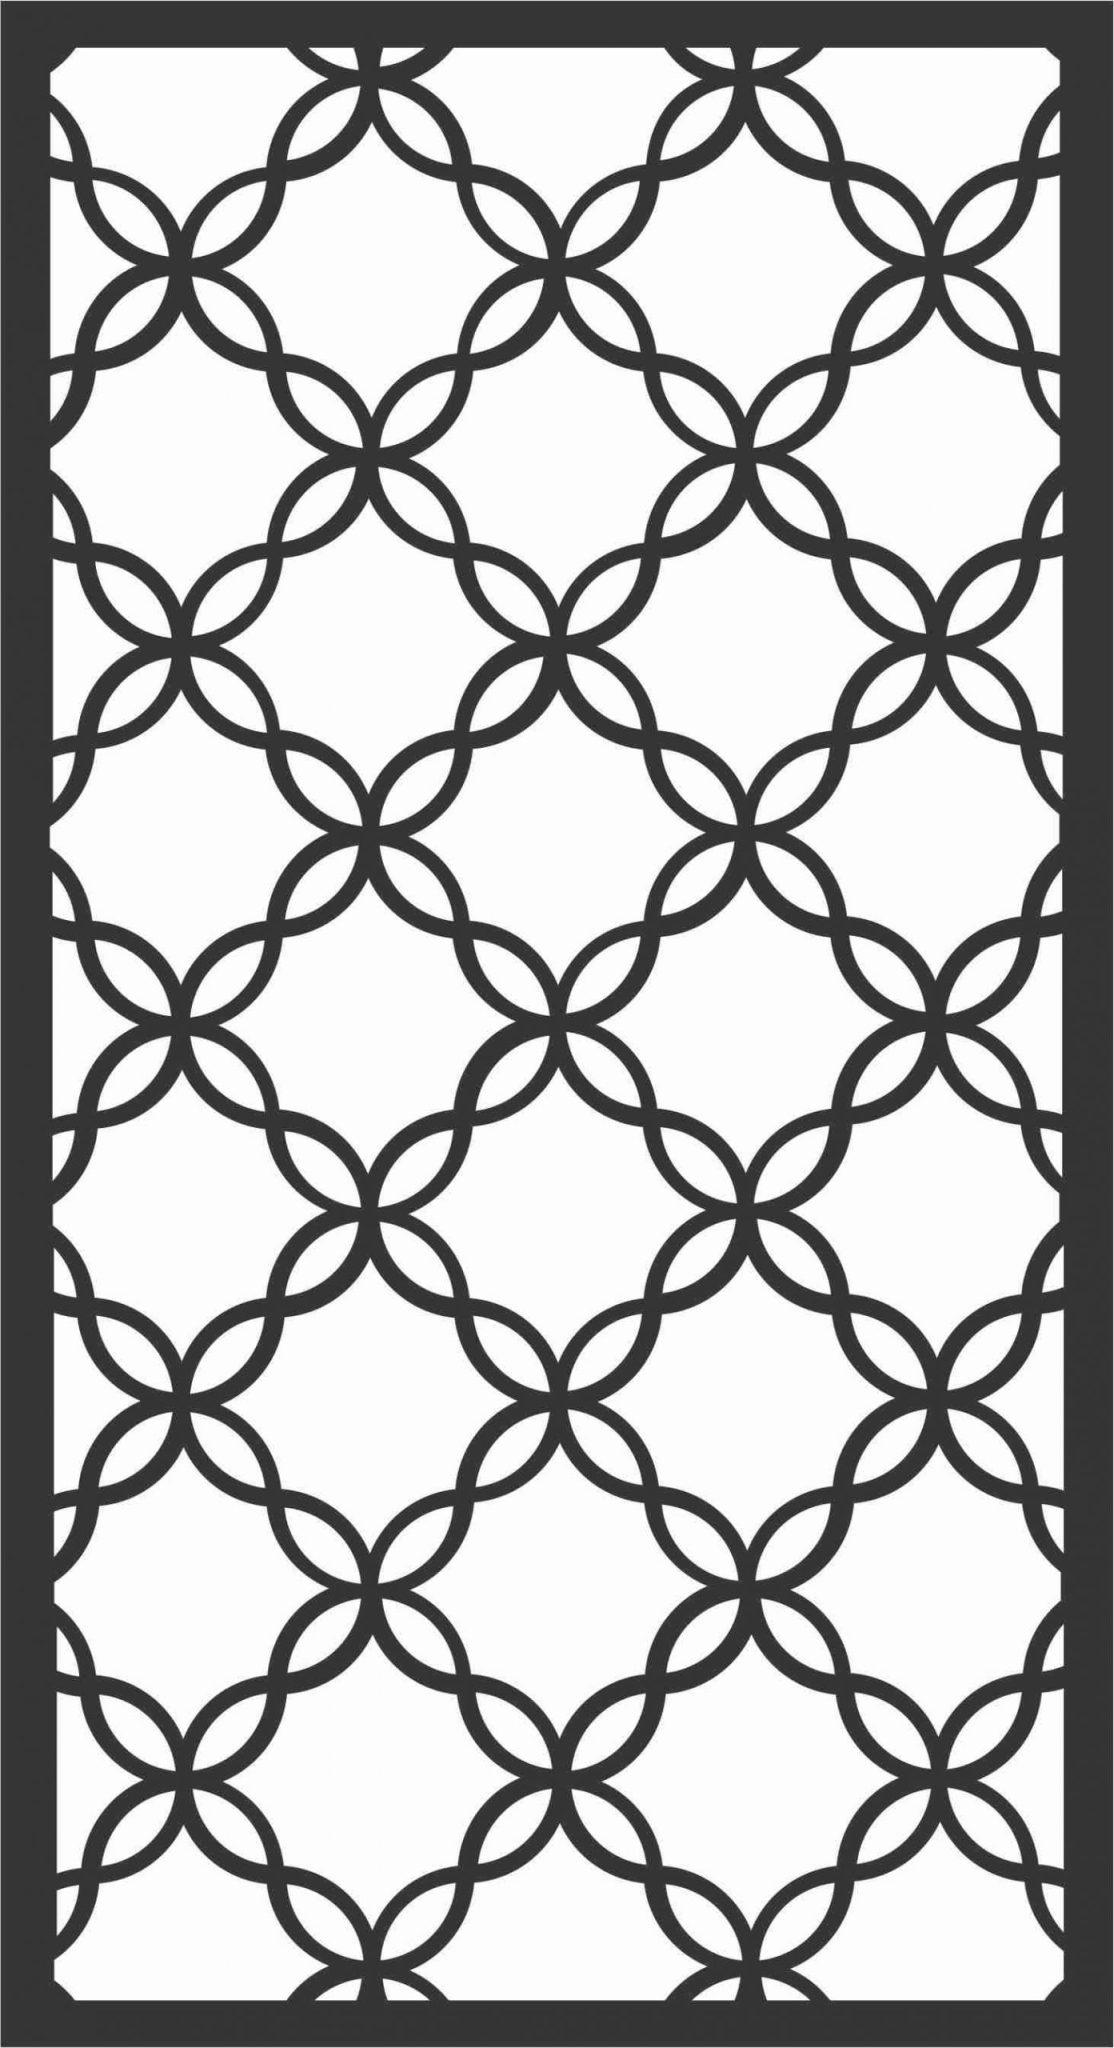 Screen Panel Patterns Seamless 24 Free DXF File